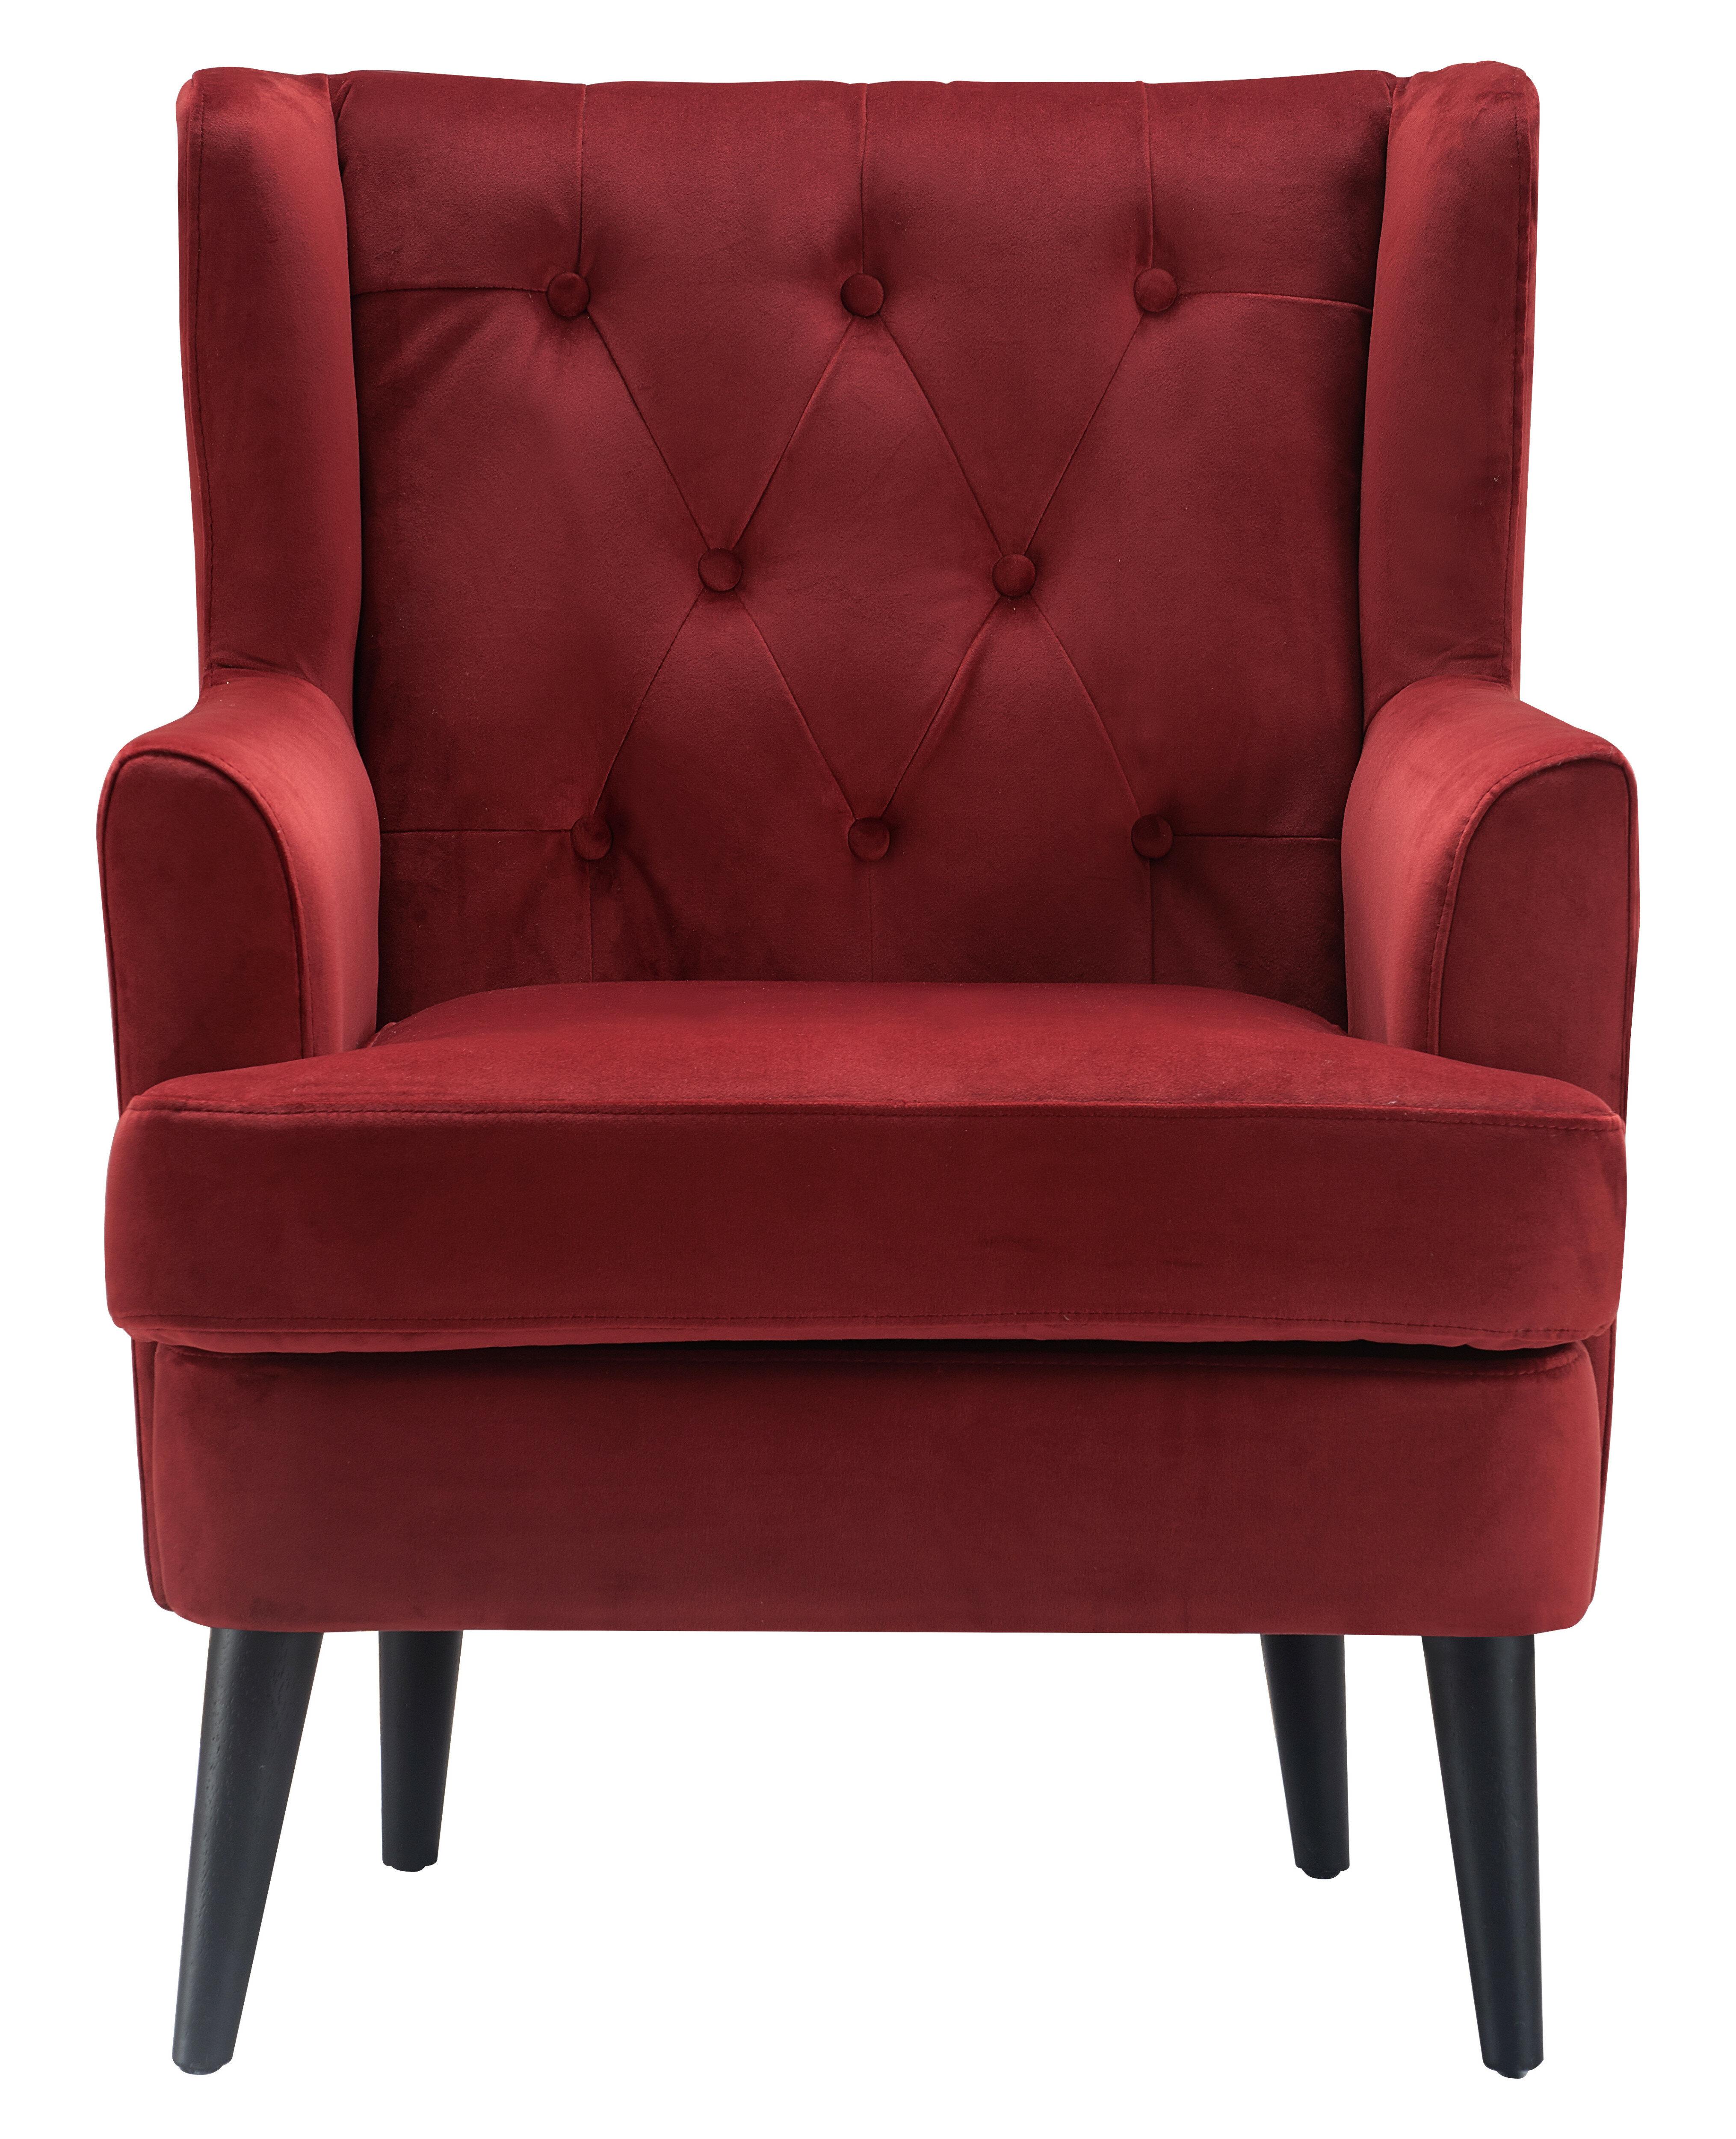 Elle Decor Celeste Wingback Chair